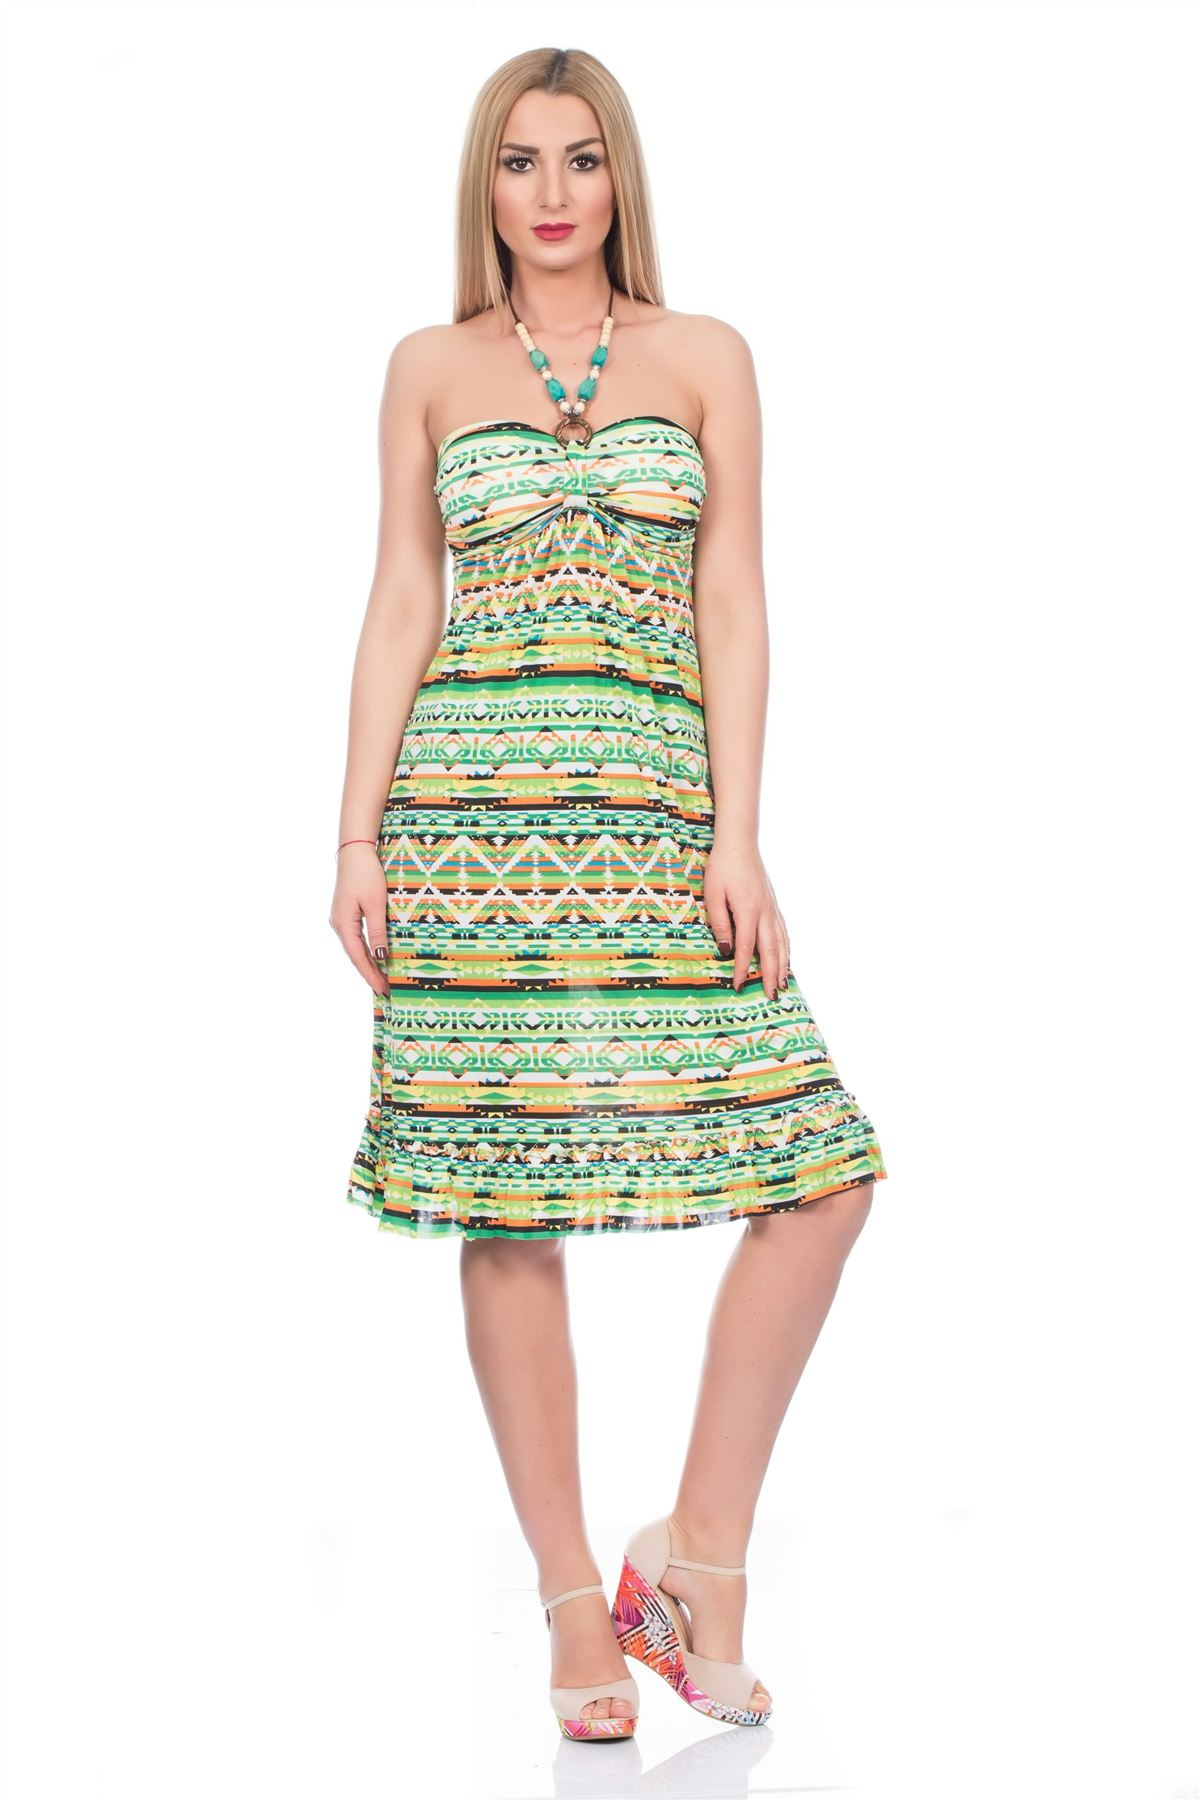 Uk womens sexy short dress aztec ladies summer shorts